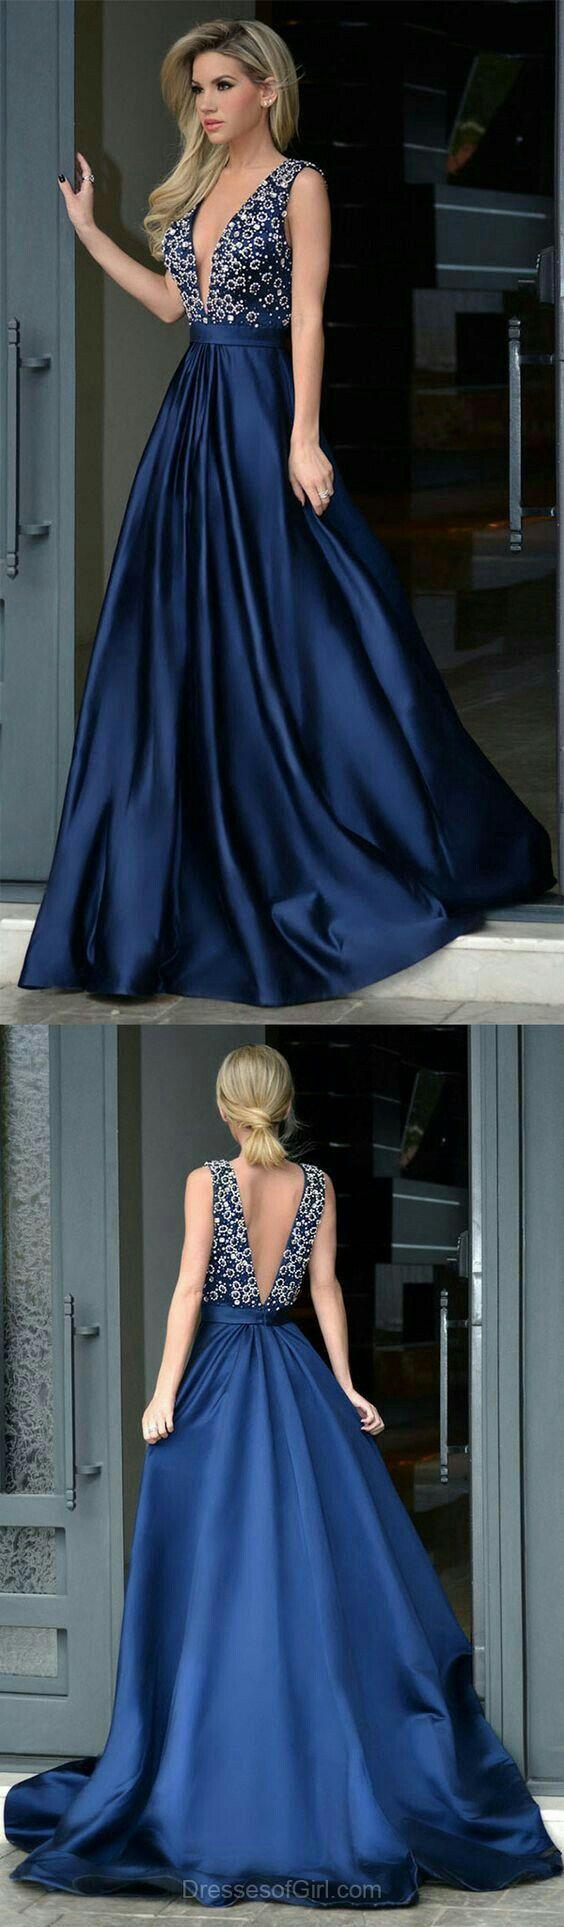 So pretty vestidos pinterest prom navy prom dresses and dress